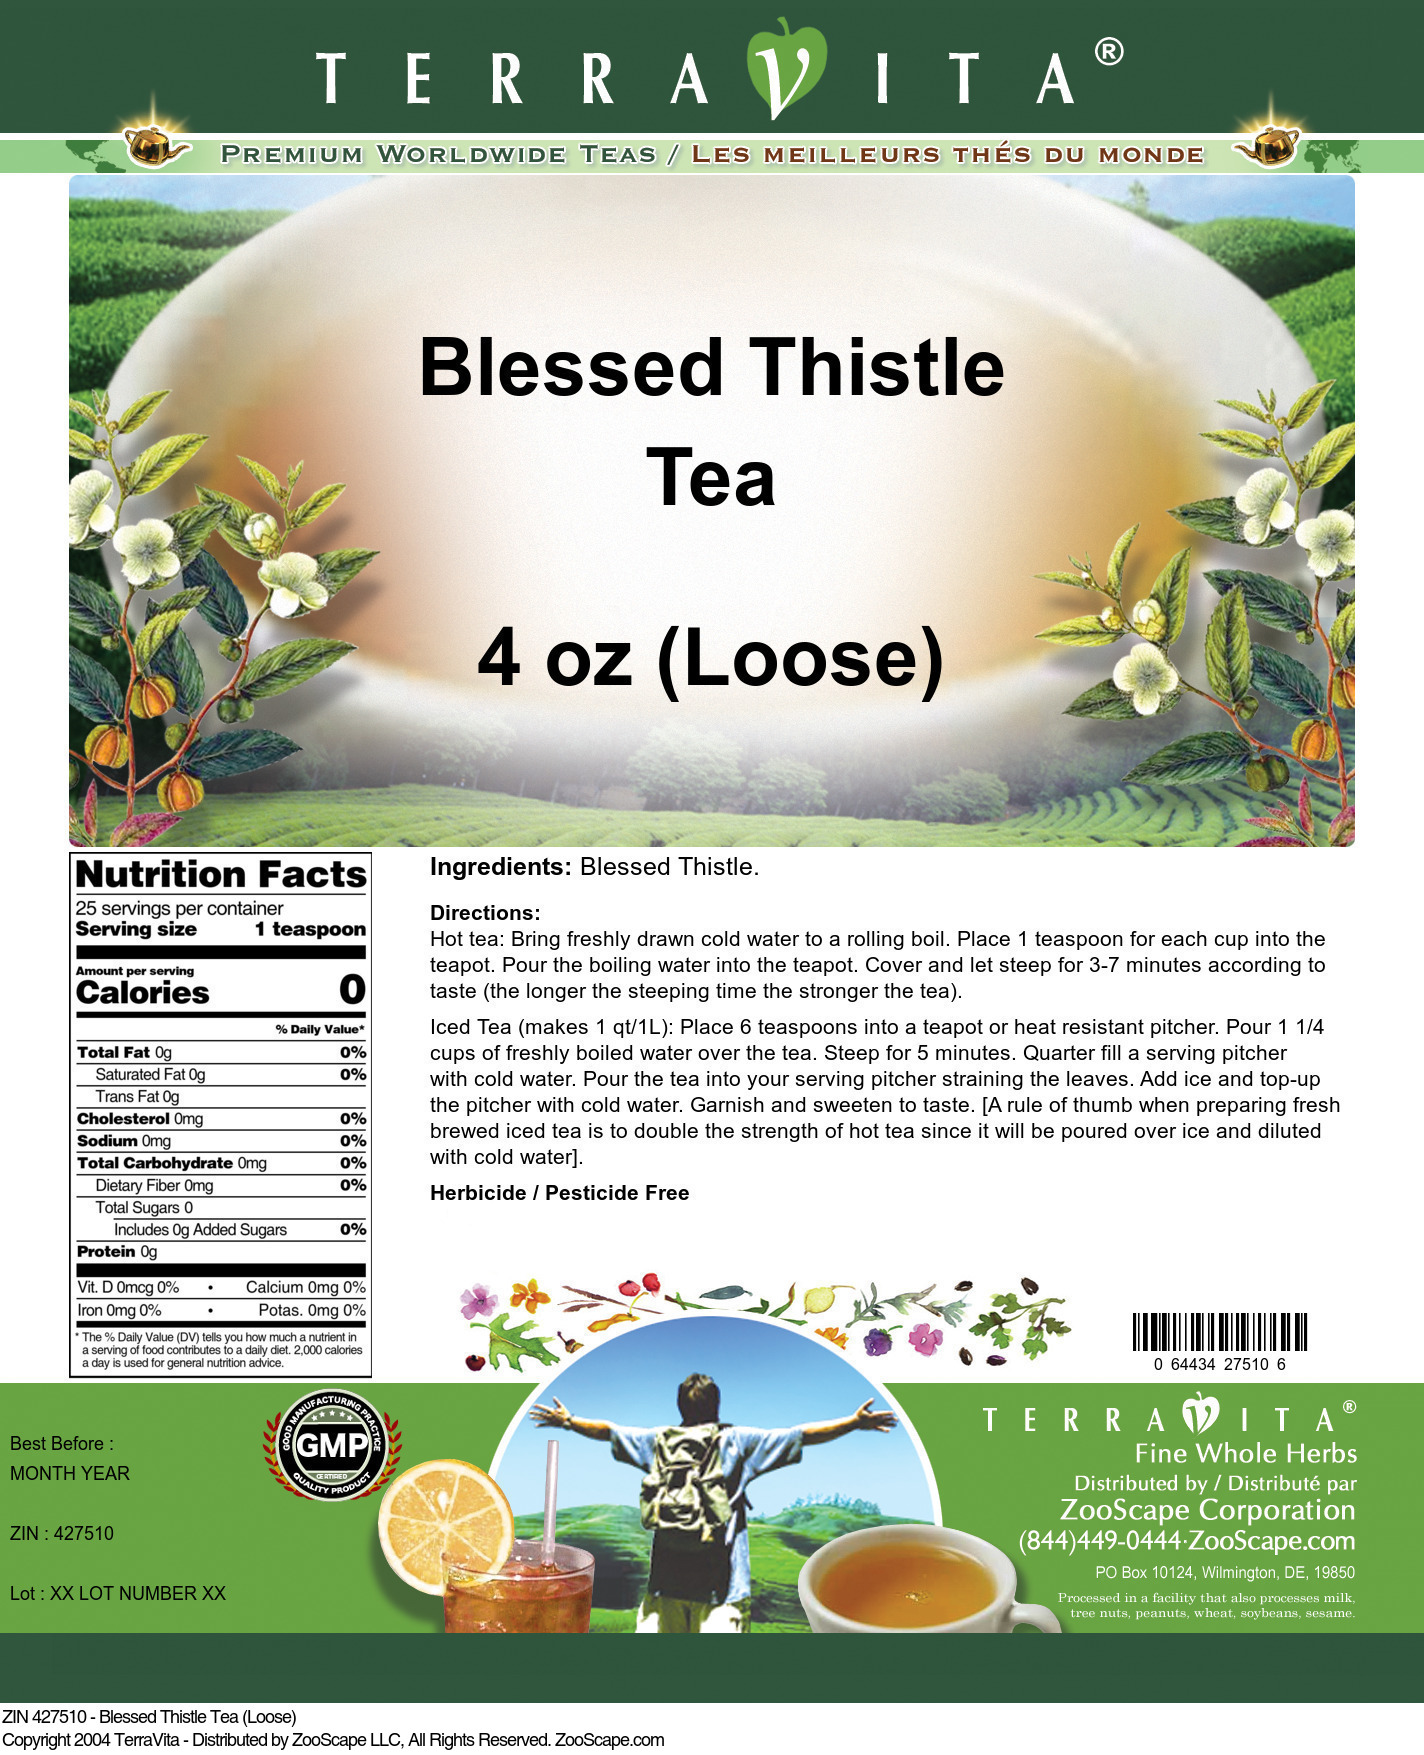 Blessed Thistle Tea (Loose)